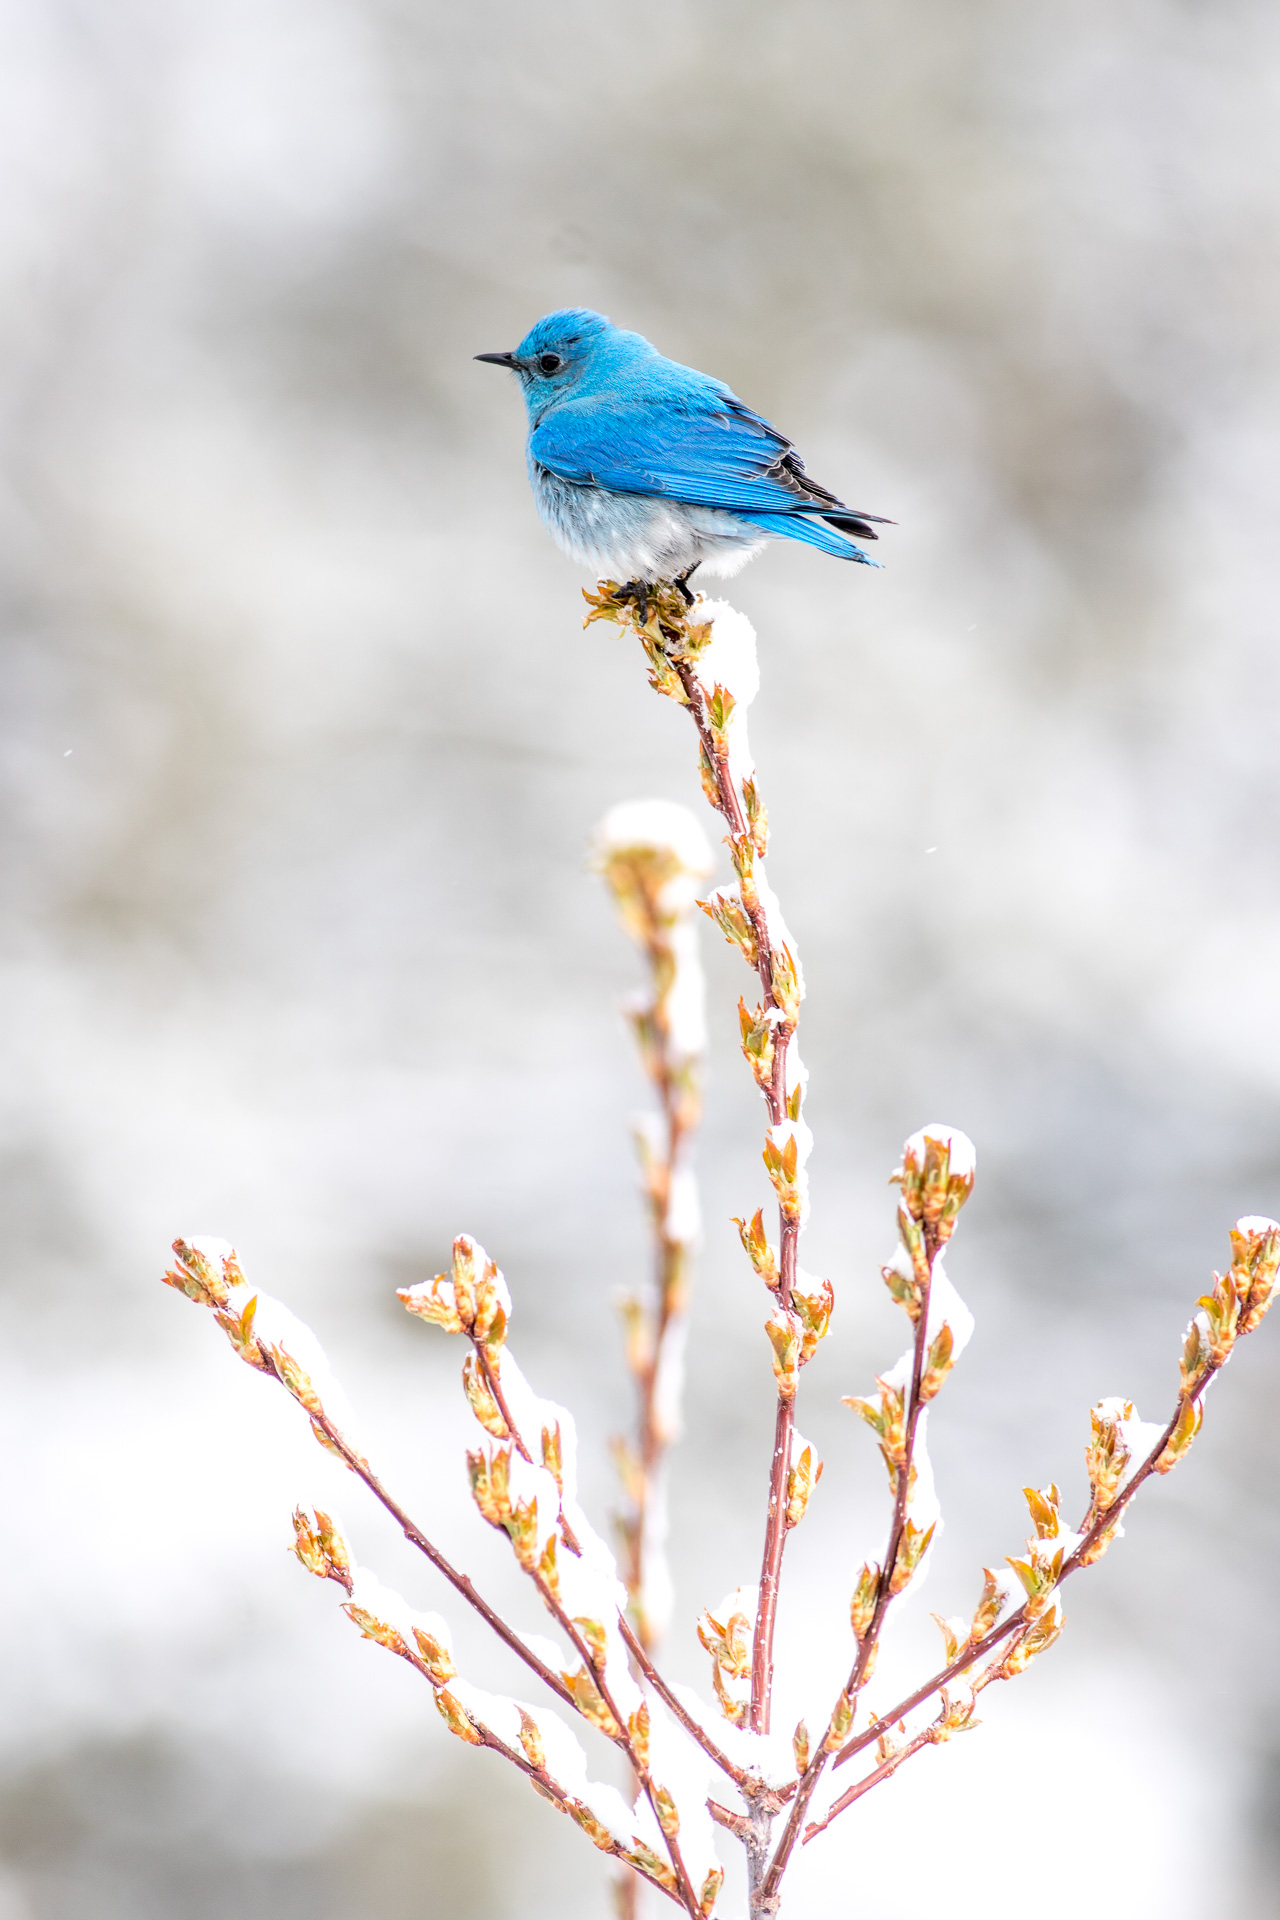 Mountain Bluebird on shrub in snowy background Yellowstone National Park WY -04846